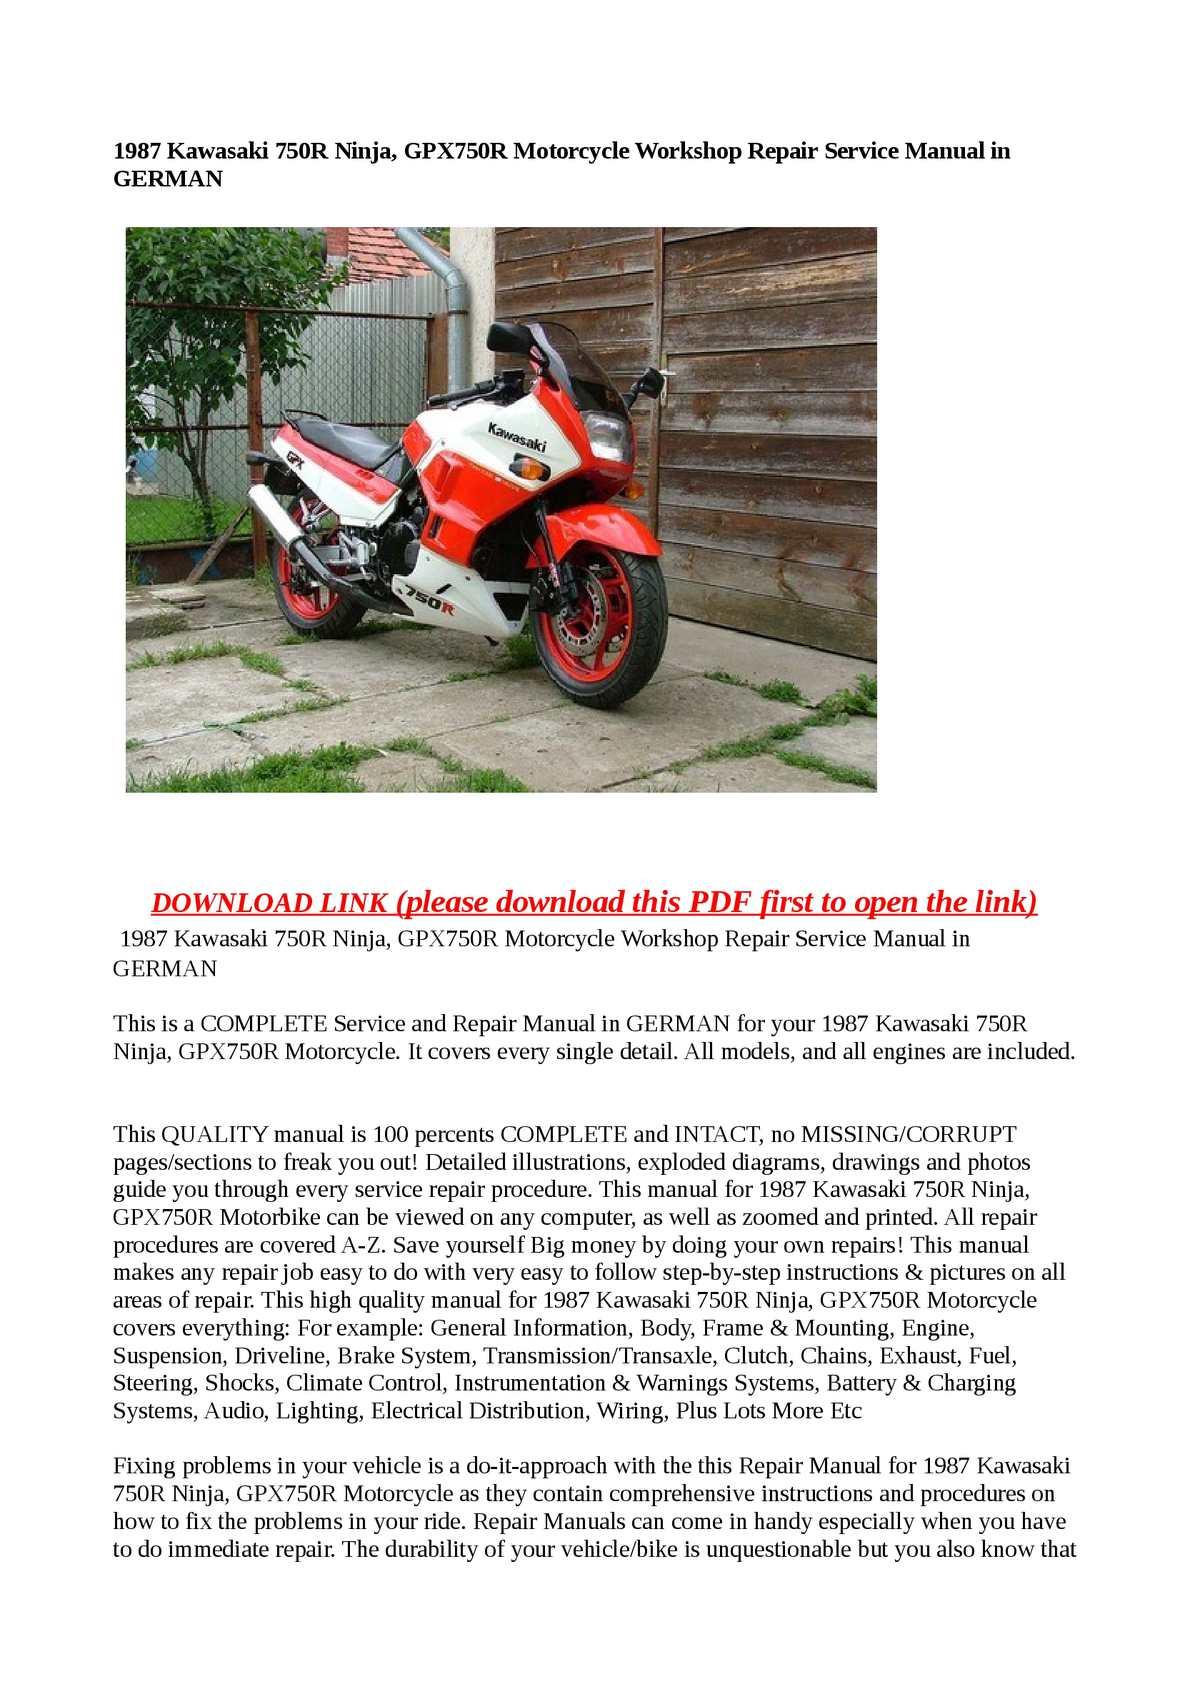 1987 Kawasaki 750R Ninja, GPX750R Motorcycle Workshop Repair Service Manual  in GERMAN